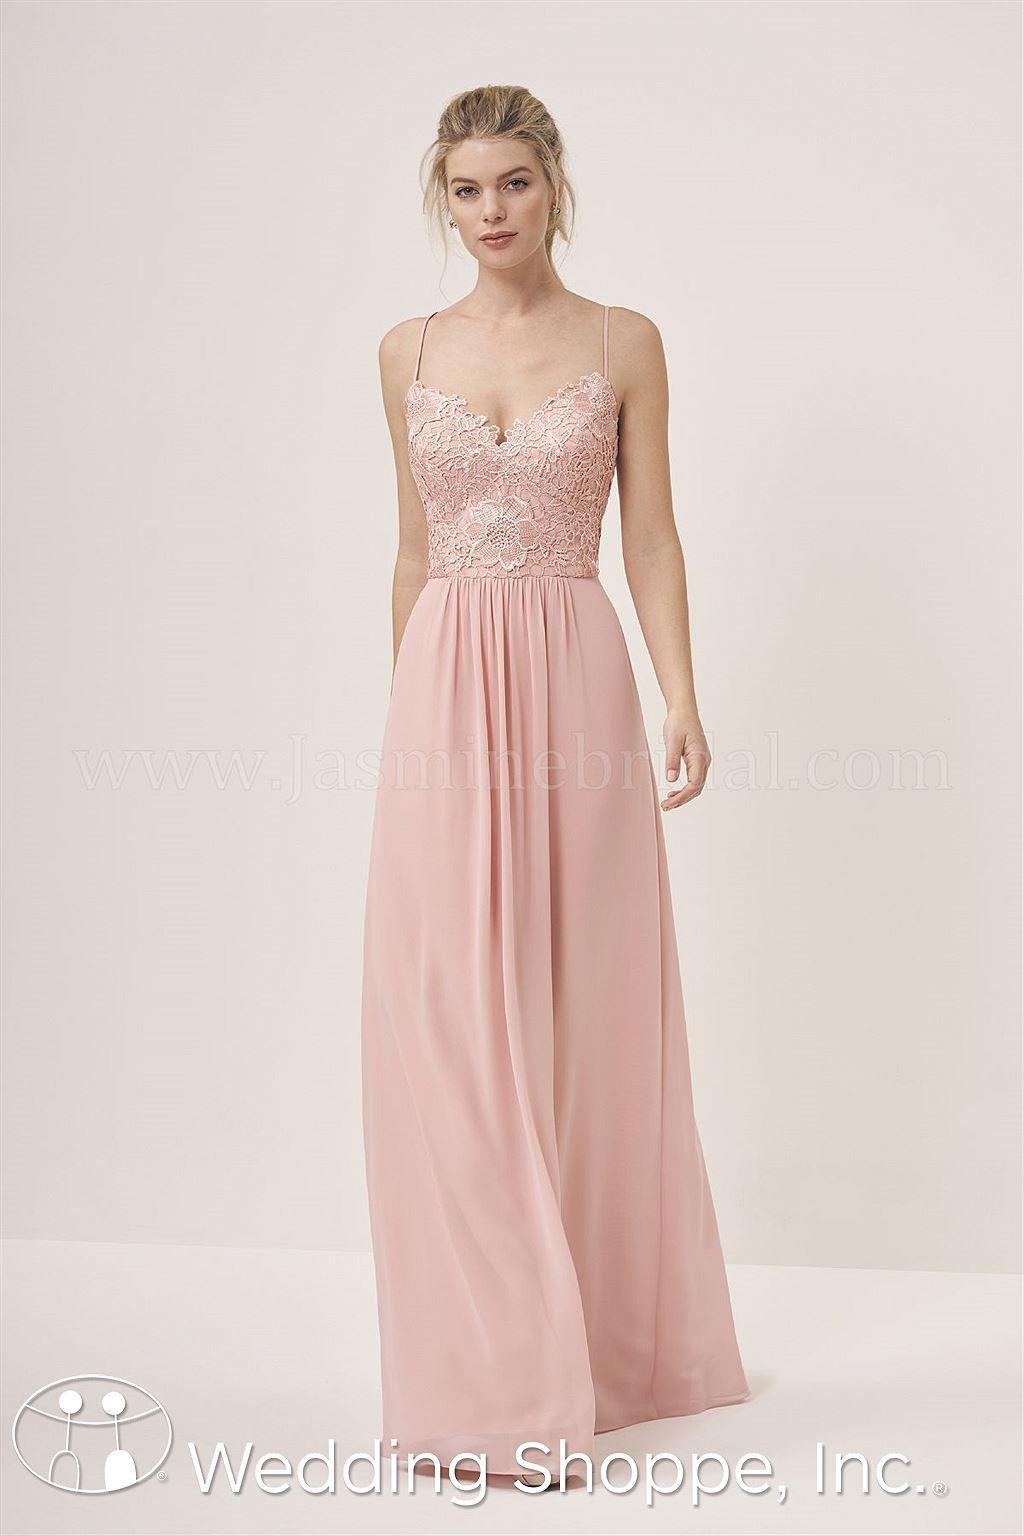 Perfecto Vestido De Novia Shoppe Molde - Ideas de Estilos de Vestido ...